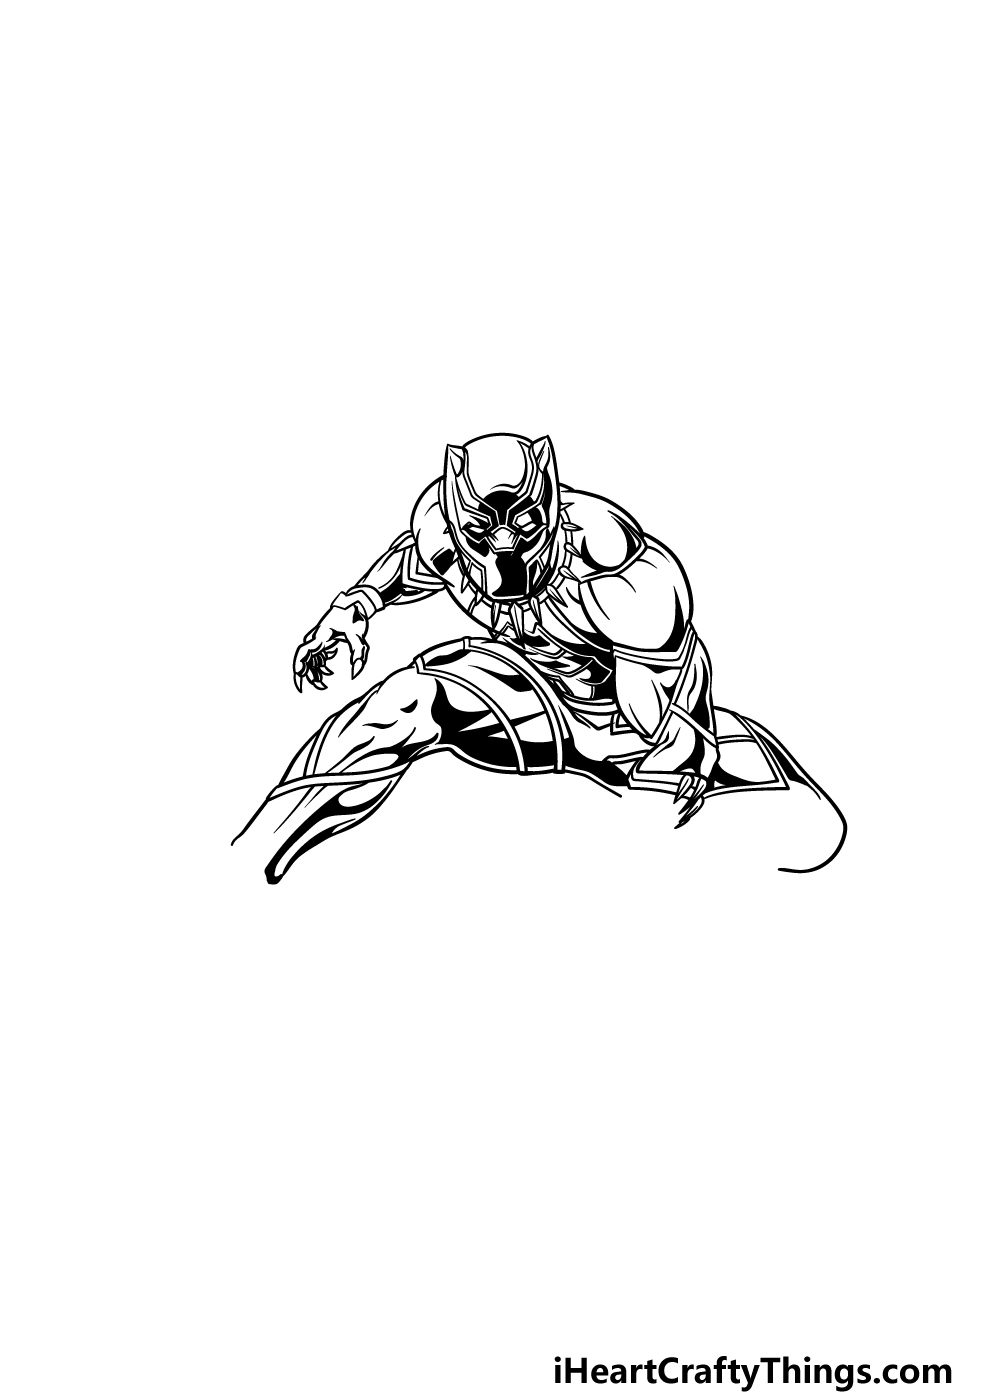 drawing Black Panther step 3